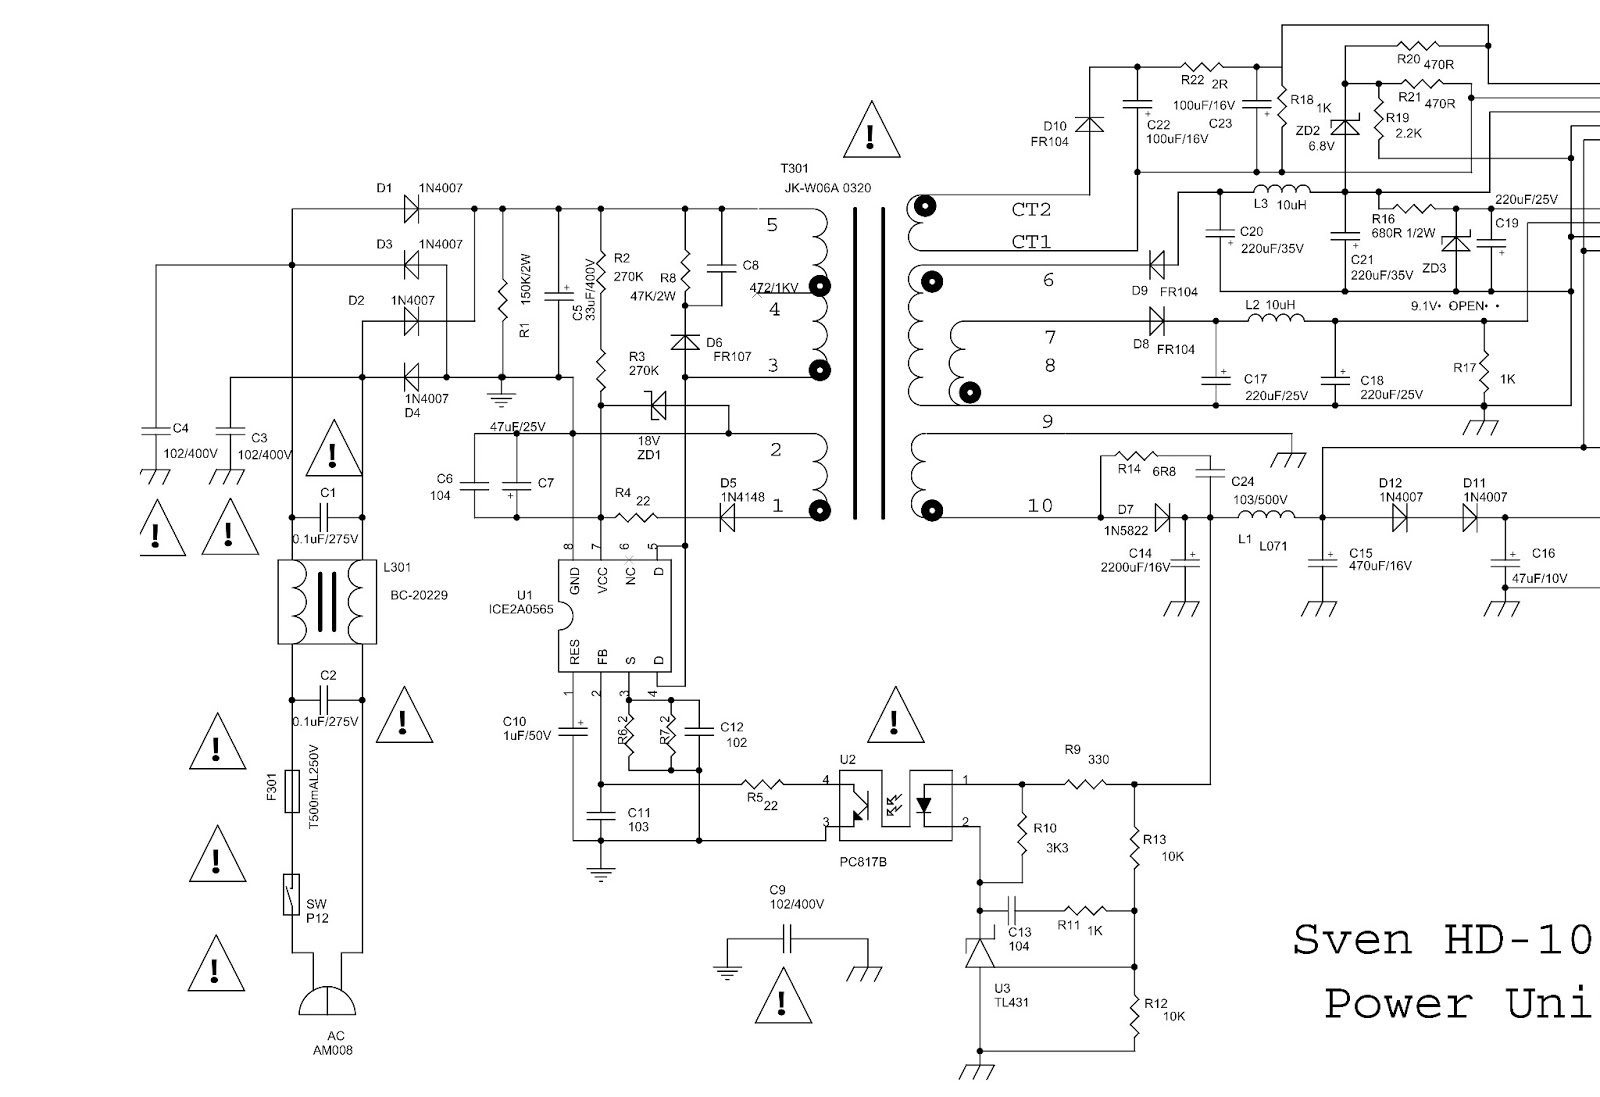 whelen power supply wiring diagram sven - hd1030 _ sanyo h860 - dvd player - power supply ... sanyo power supply wiring diagram #15